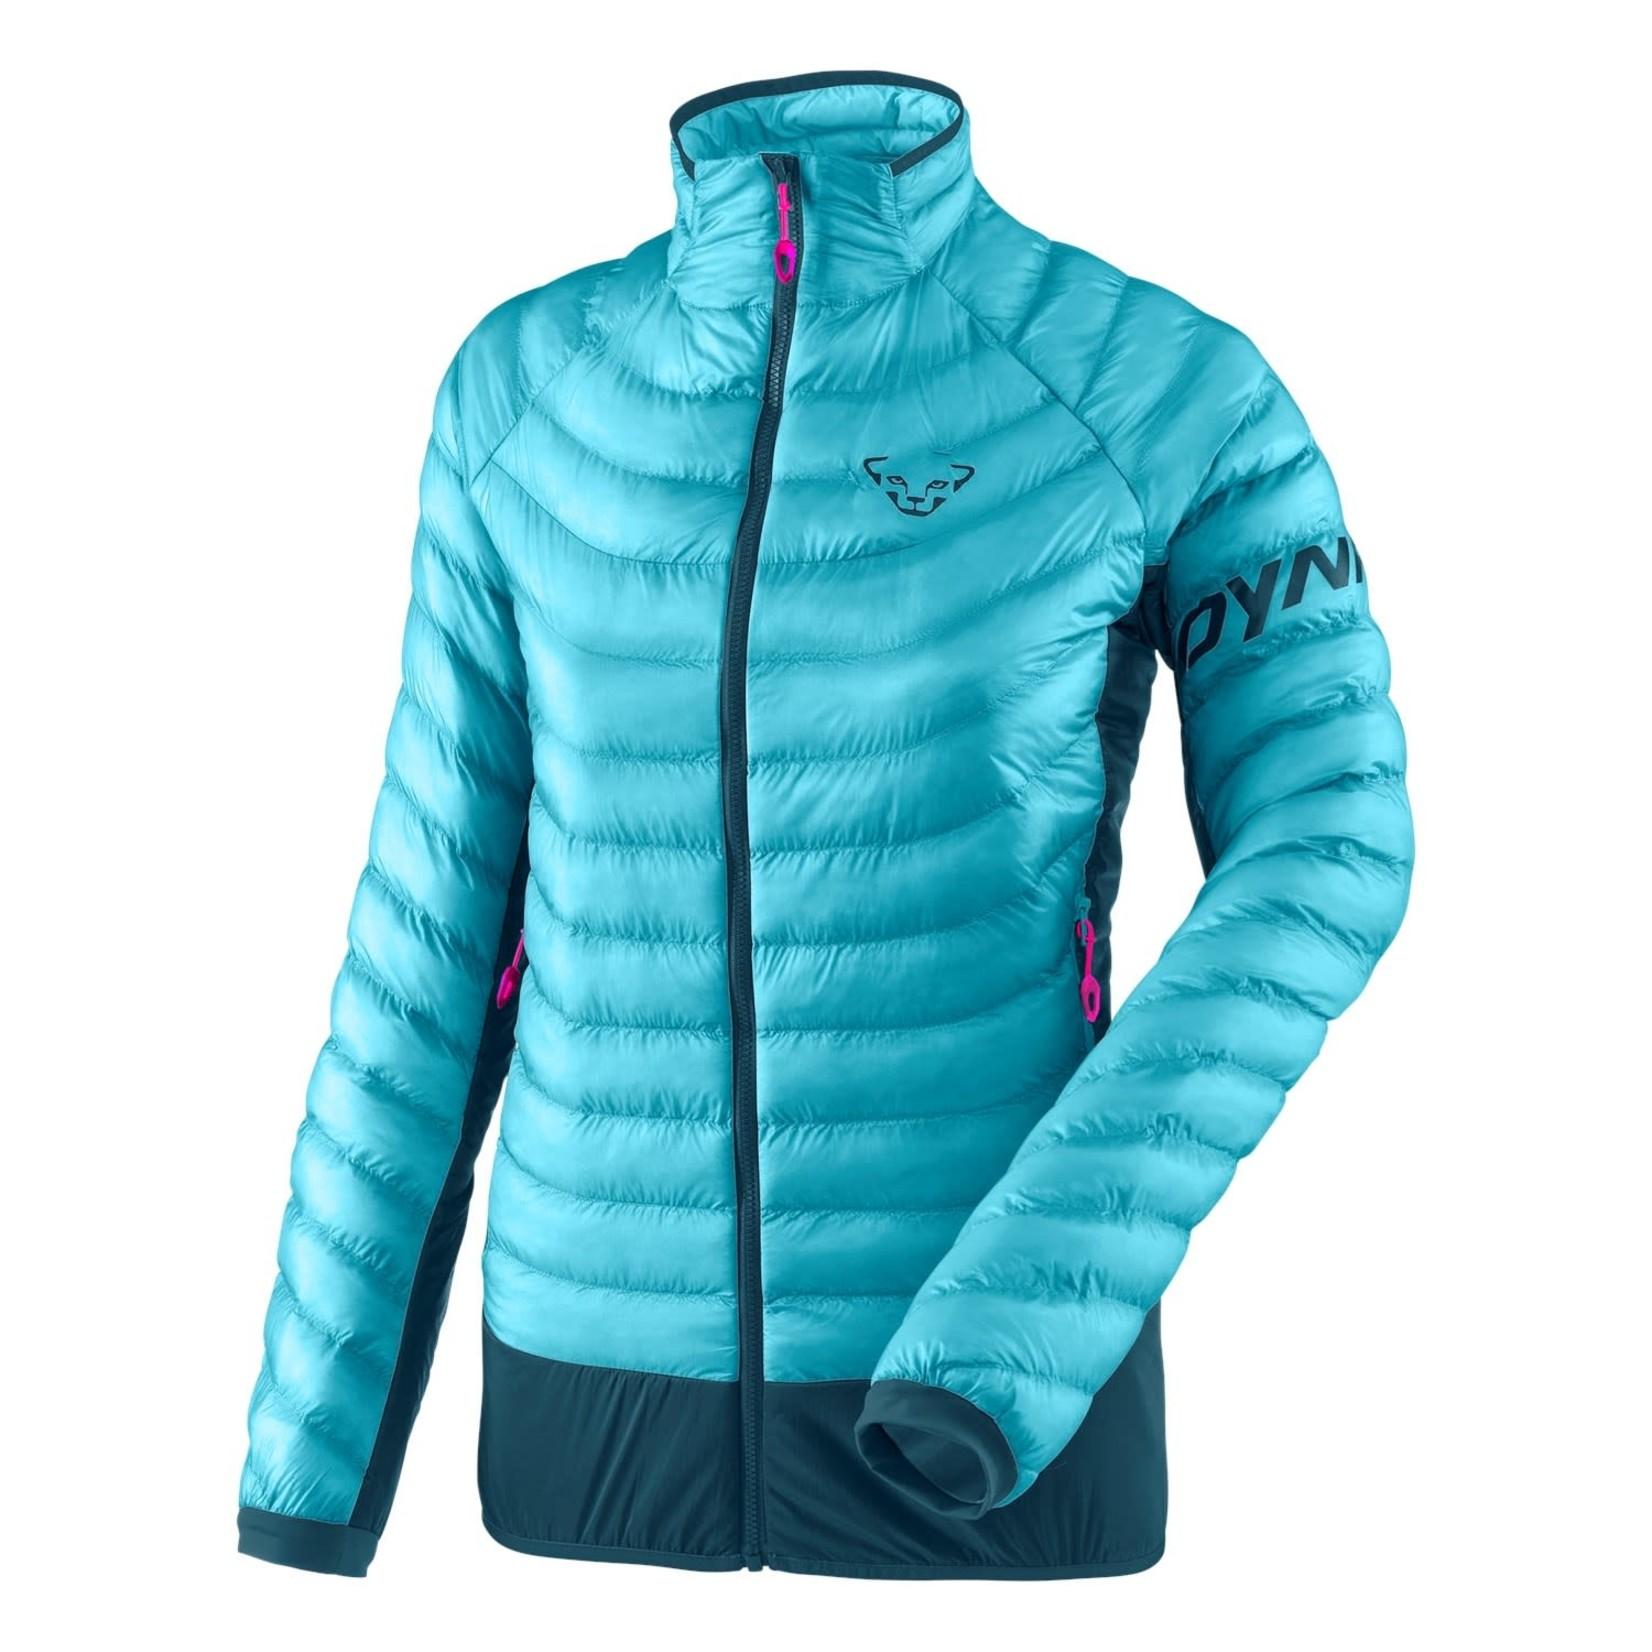 Dynafit Dynafit TLT Light Insulation Jacket - Women